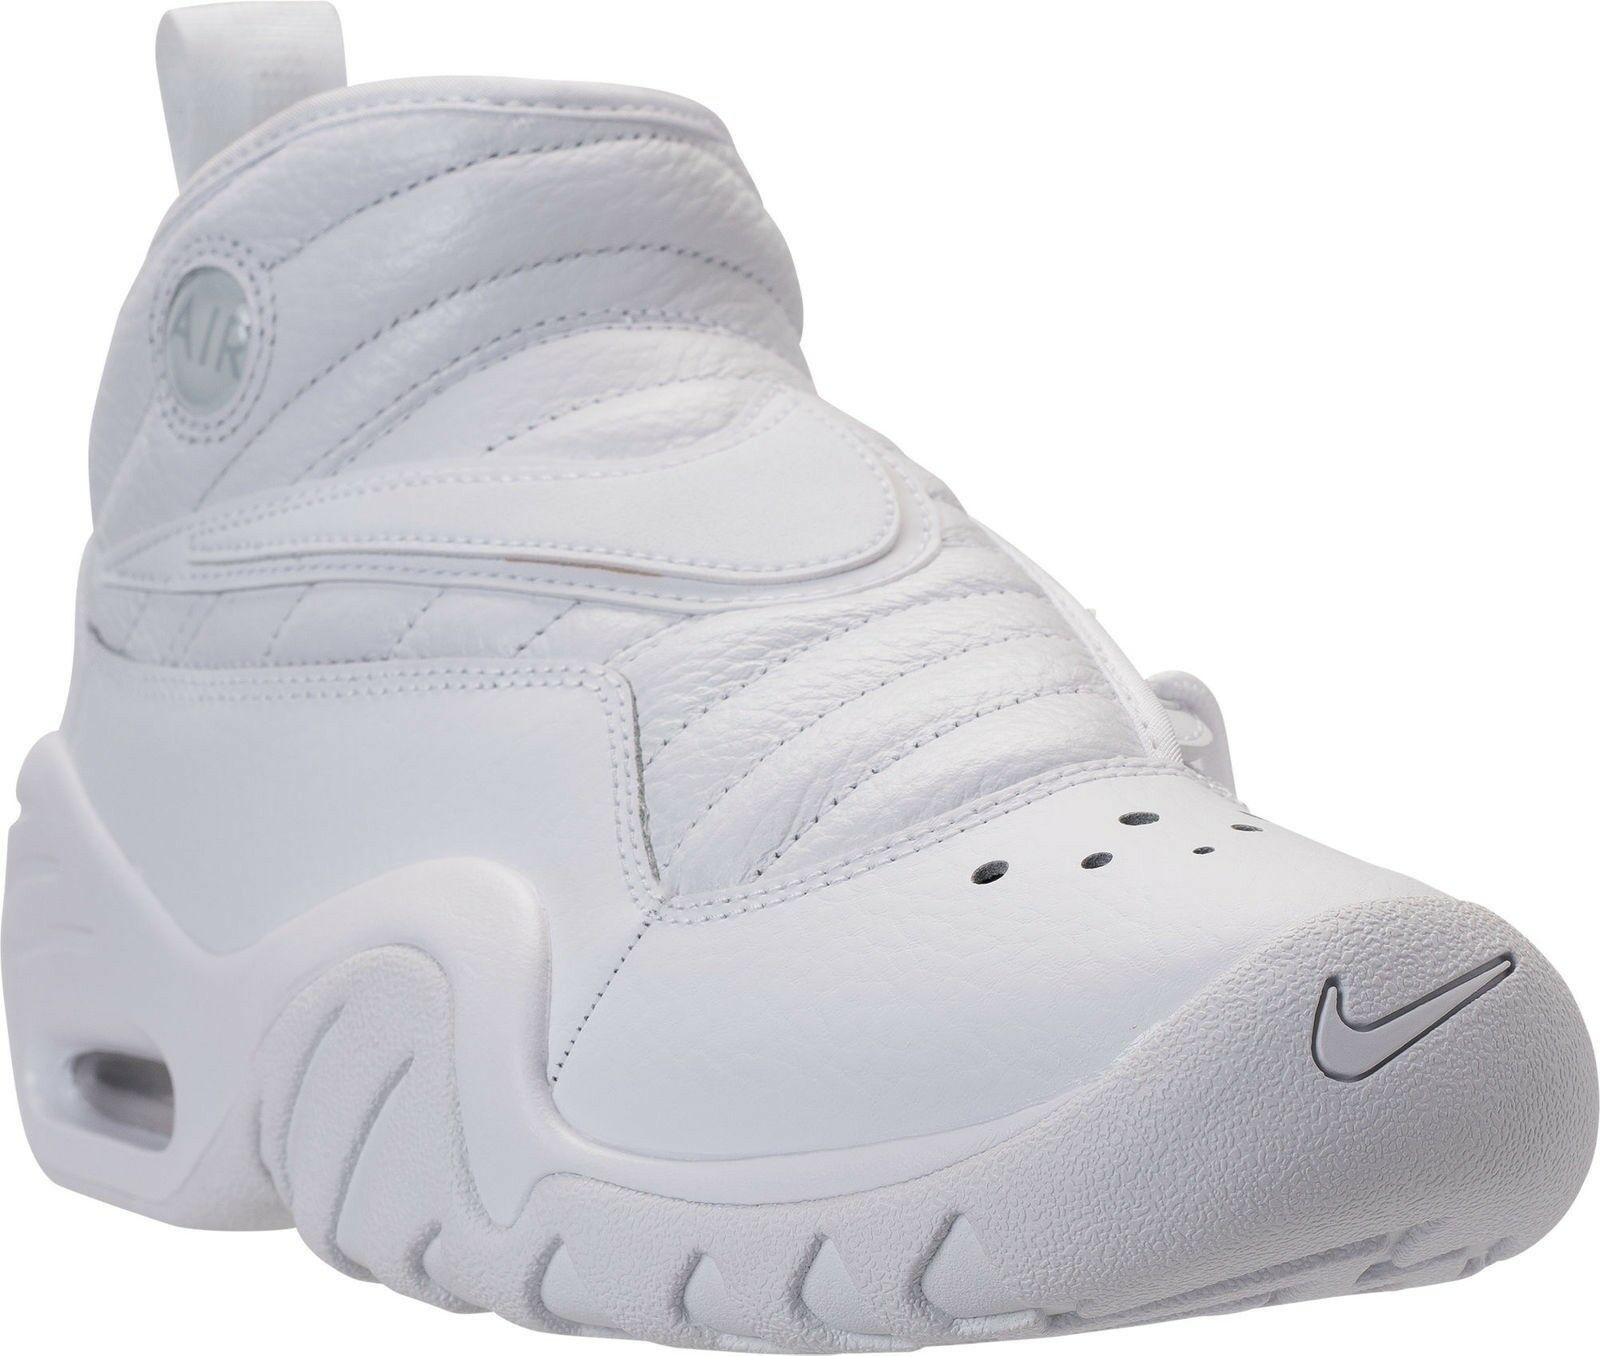 Gli uomini le scarpe scarpe nike air atletico scarpe le da basket ndestrukt cuoio bianco d1dff2